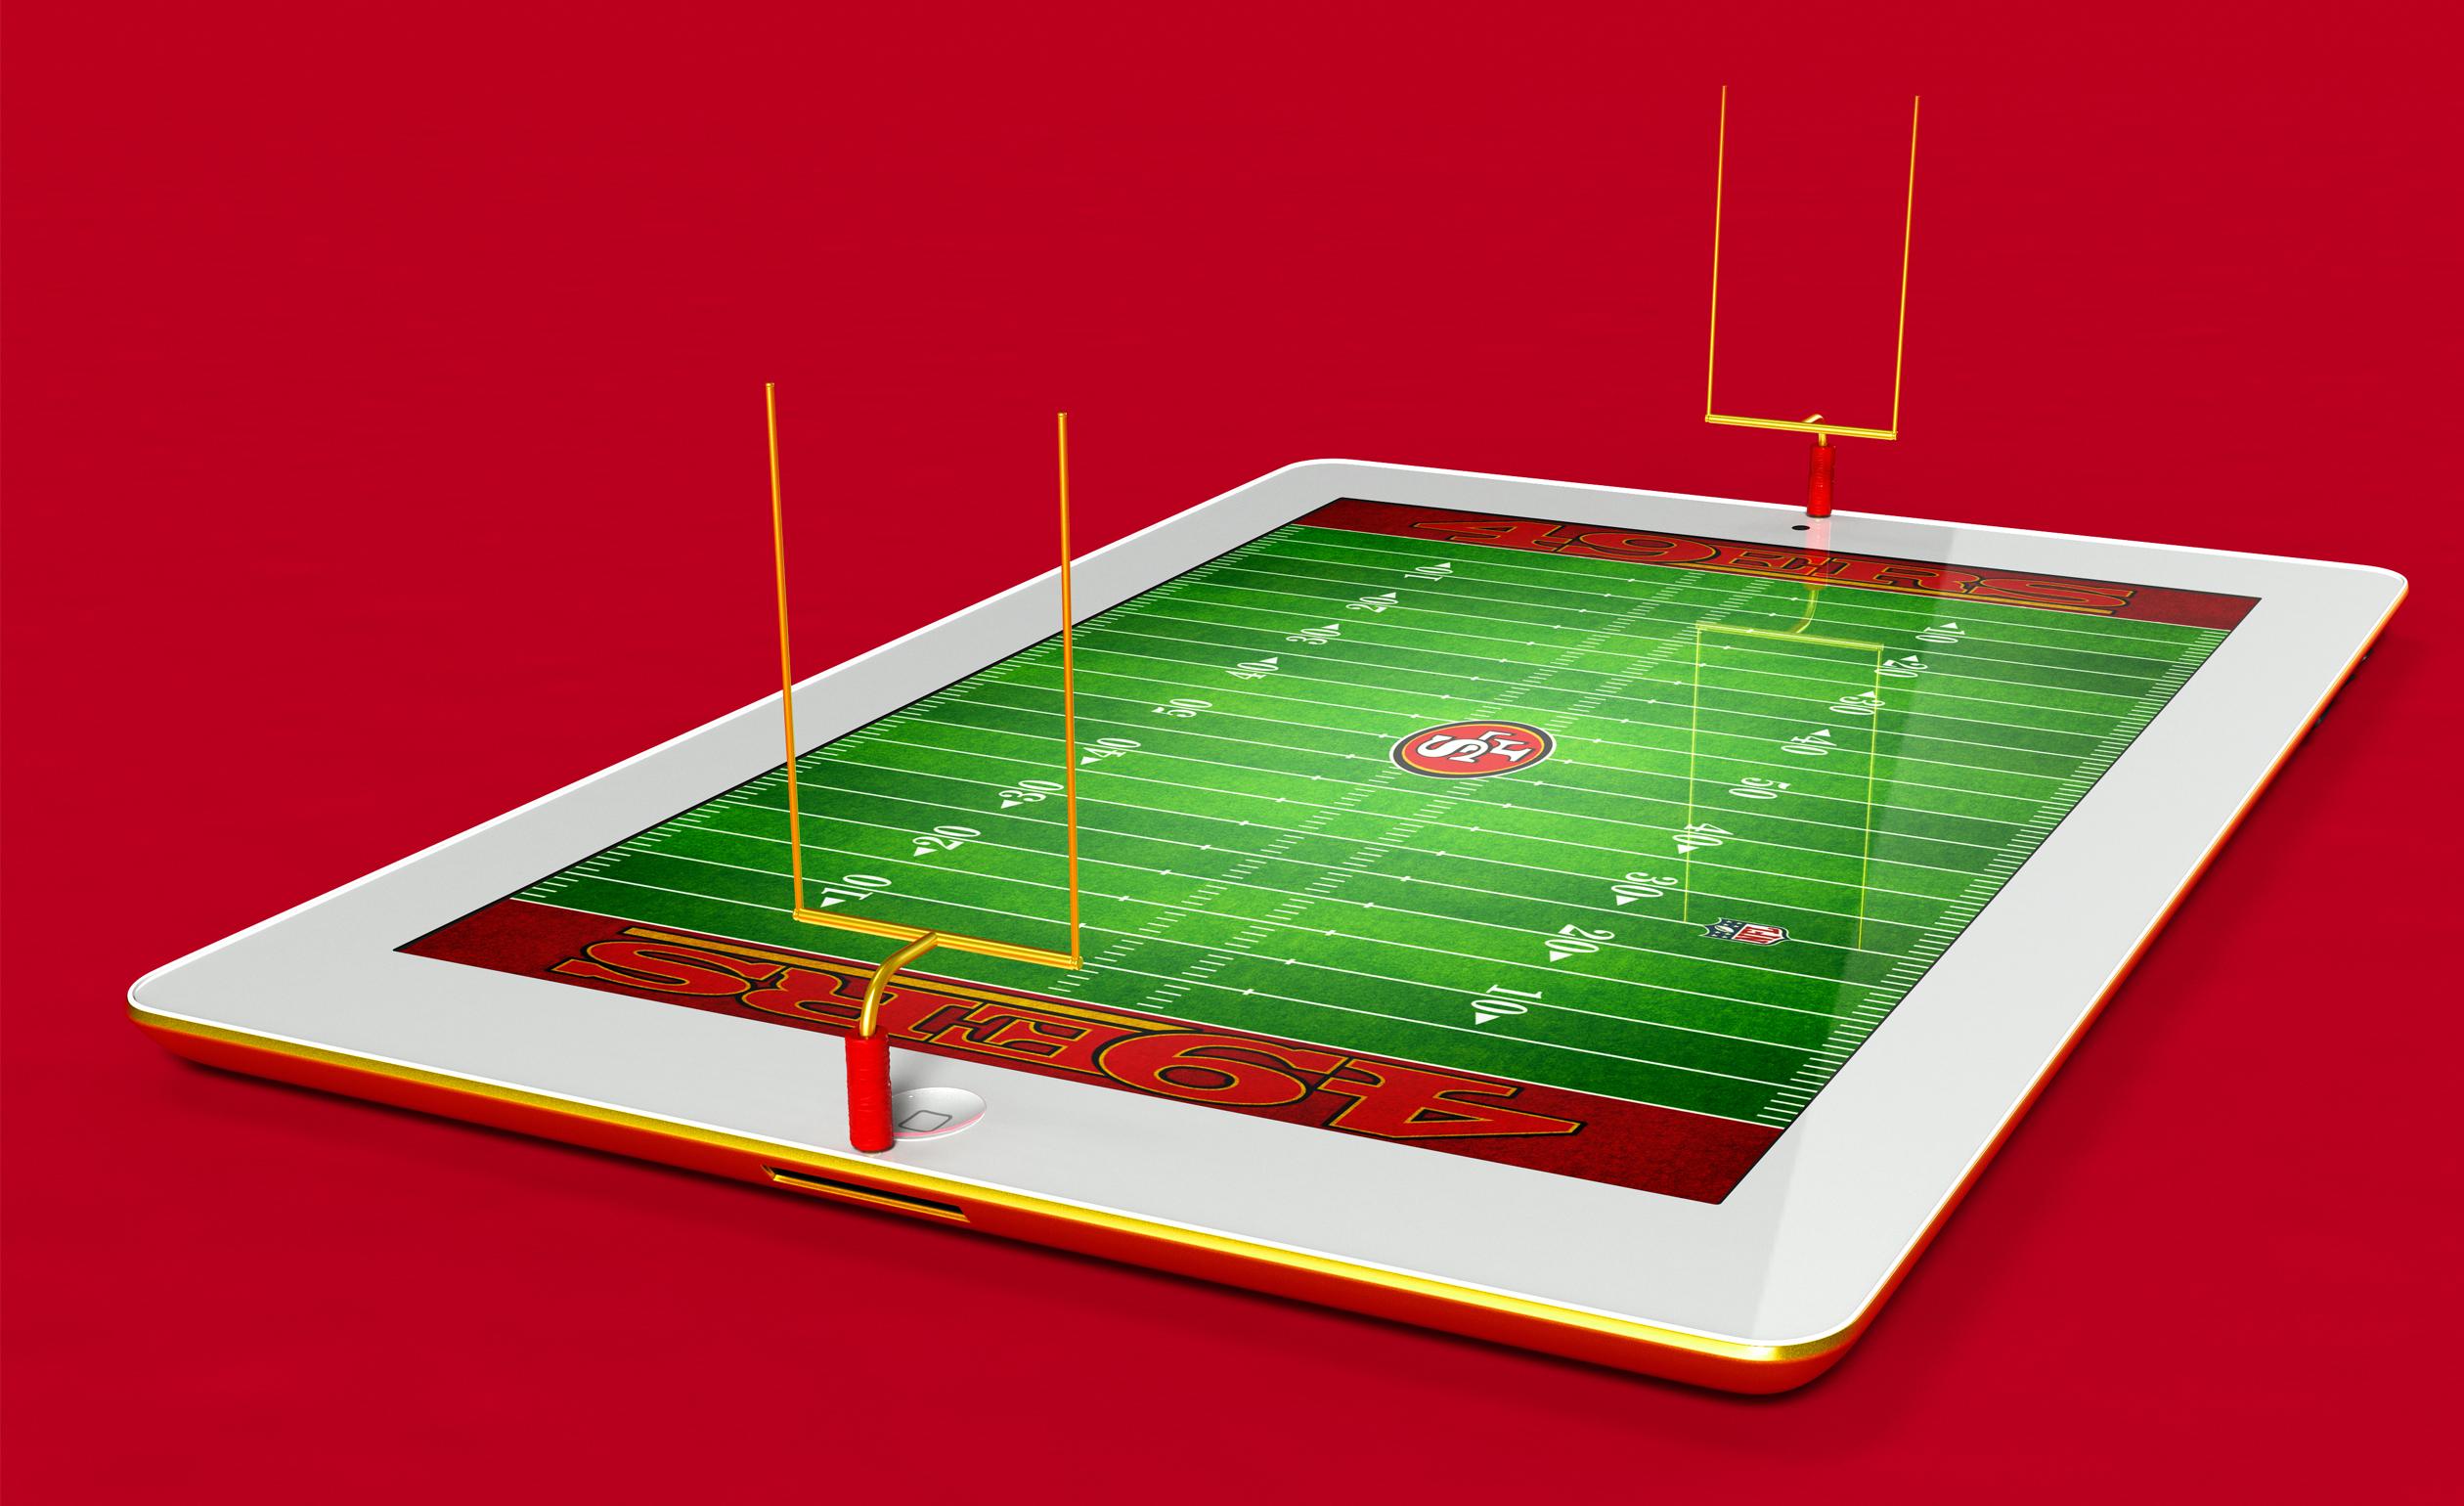 San Francisco 49ers, Levi's Stadium